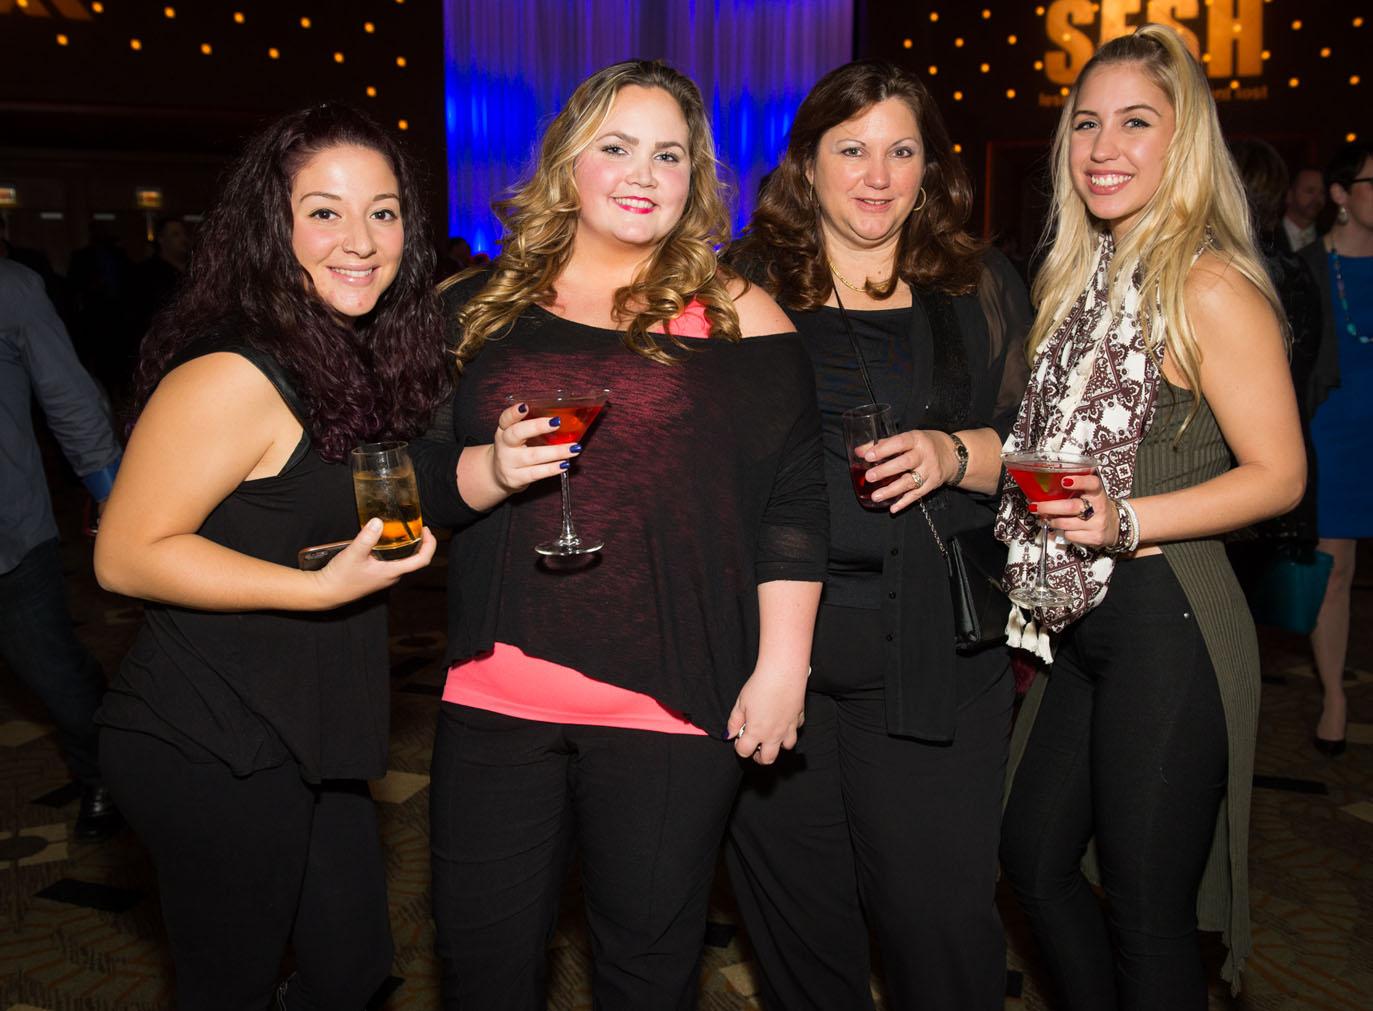 2015-12-09 ReMax Corpoarte Event - The Borgata - Atlantic City NJ - Photo Sesh - 2015-5100.jpg